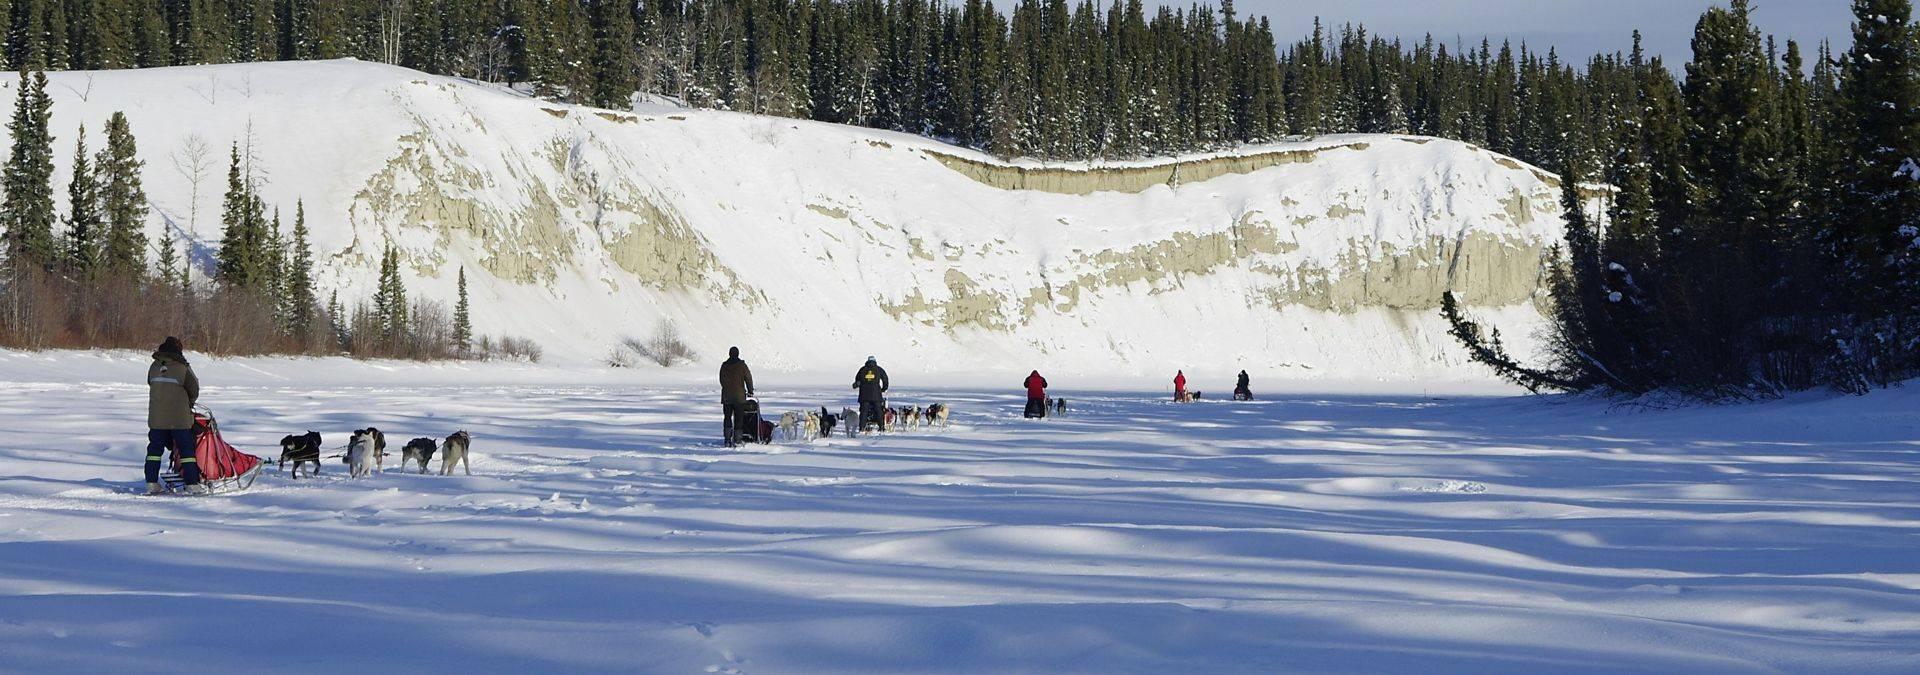 Dog Sledding 6 Credit Arctic Range Adventure Ltd